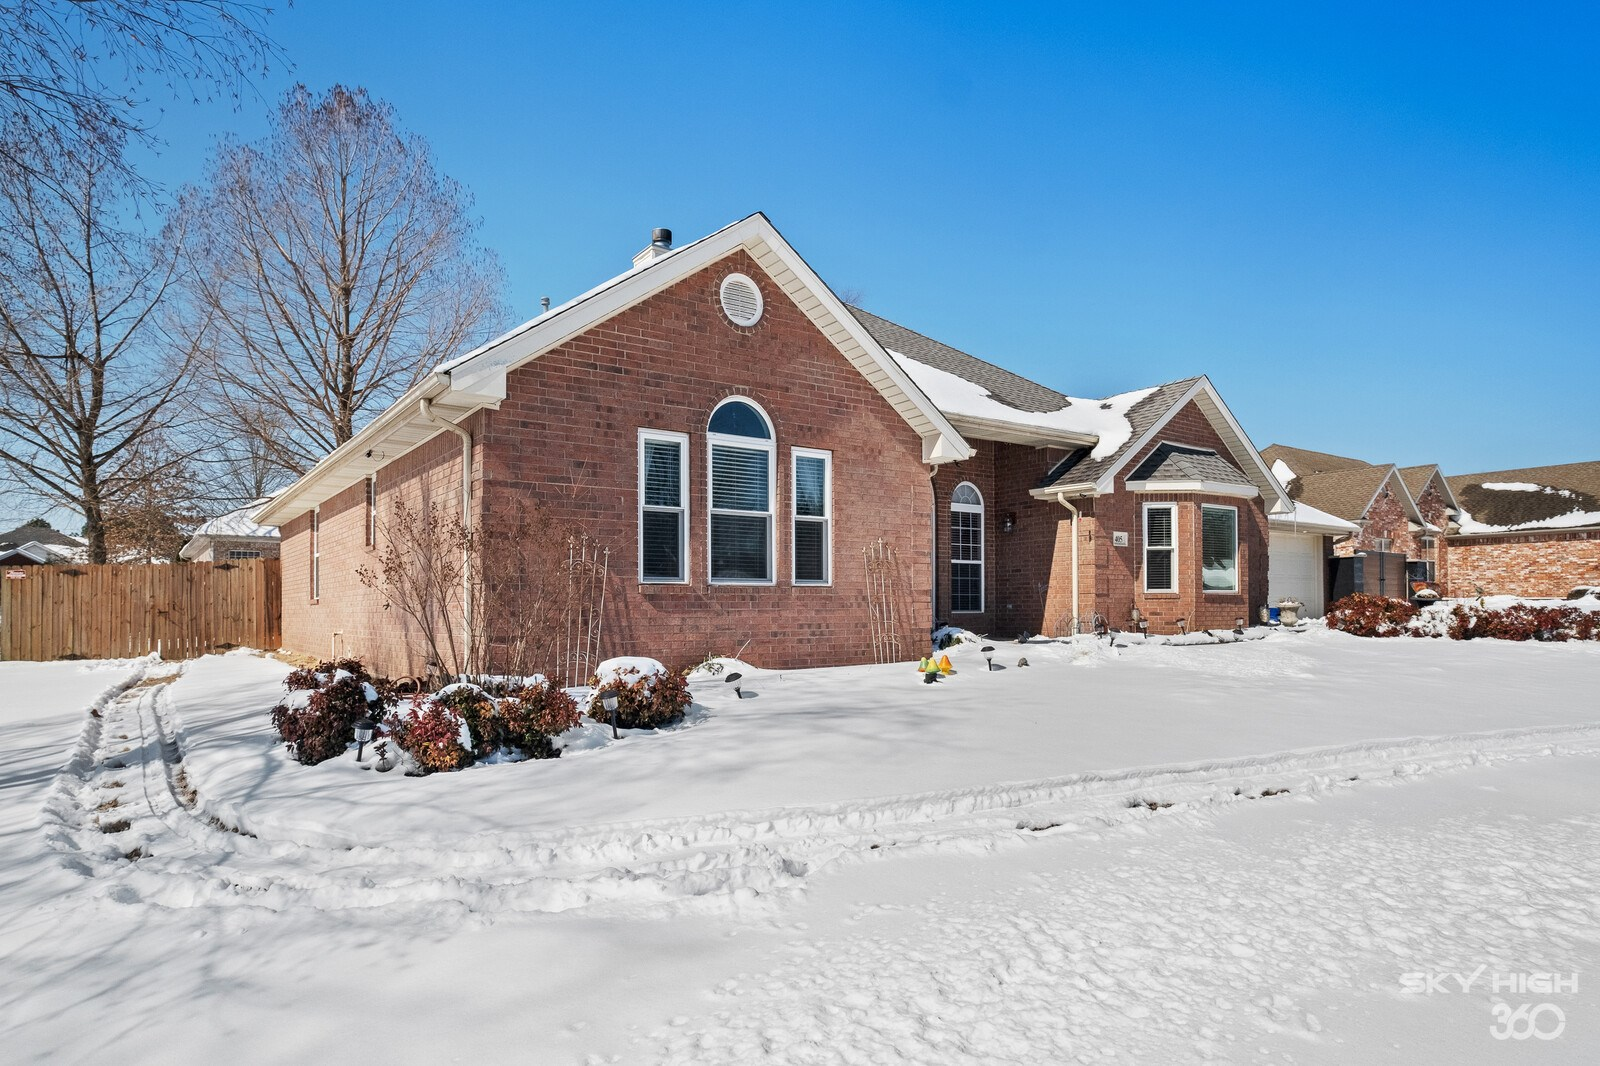 Home for Sale in Northwest Bentonville